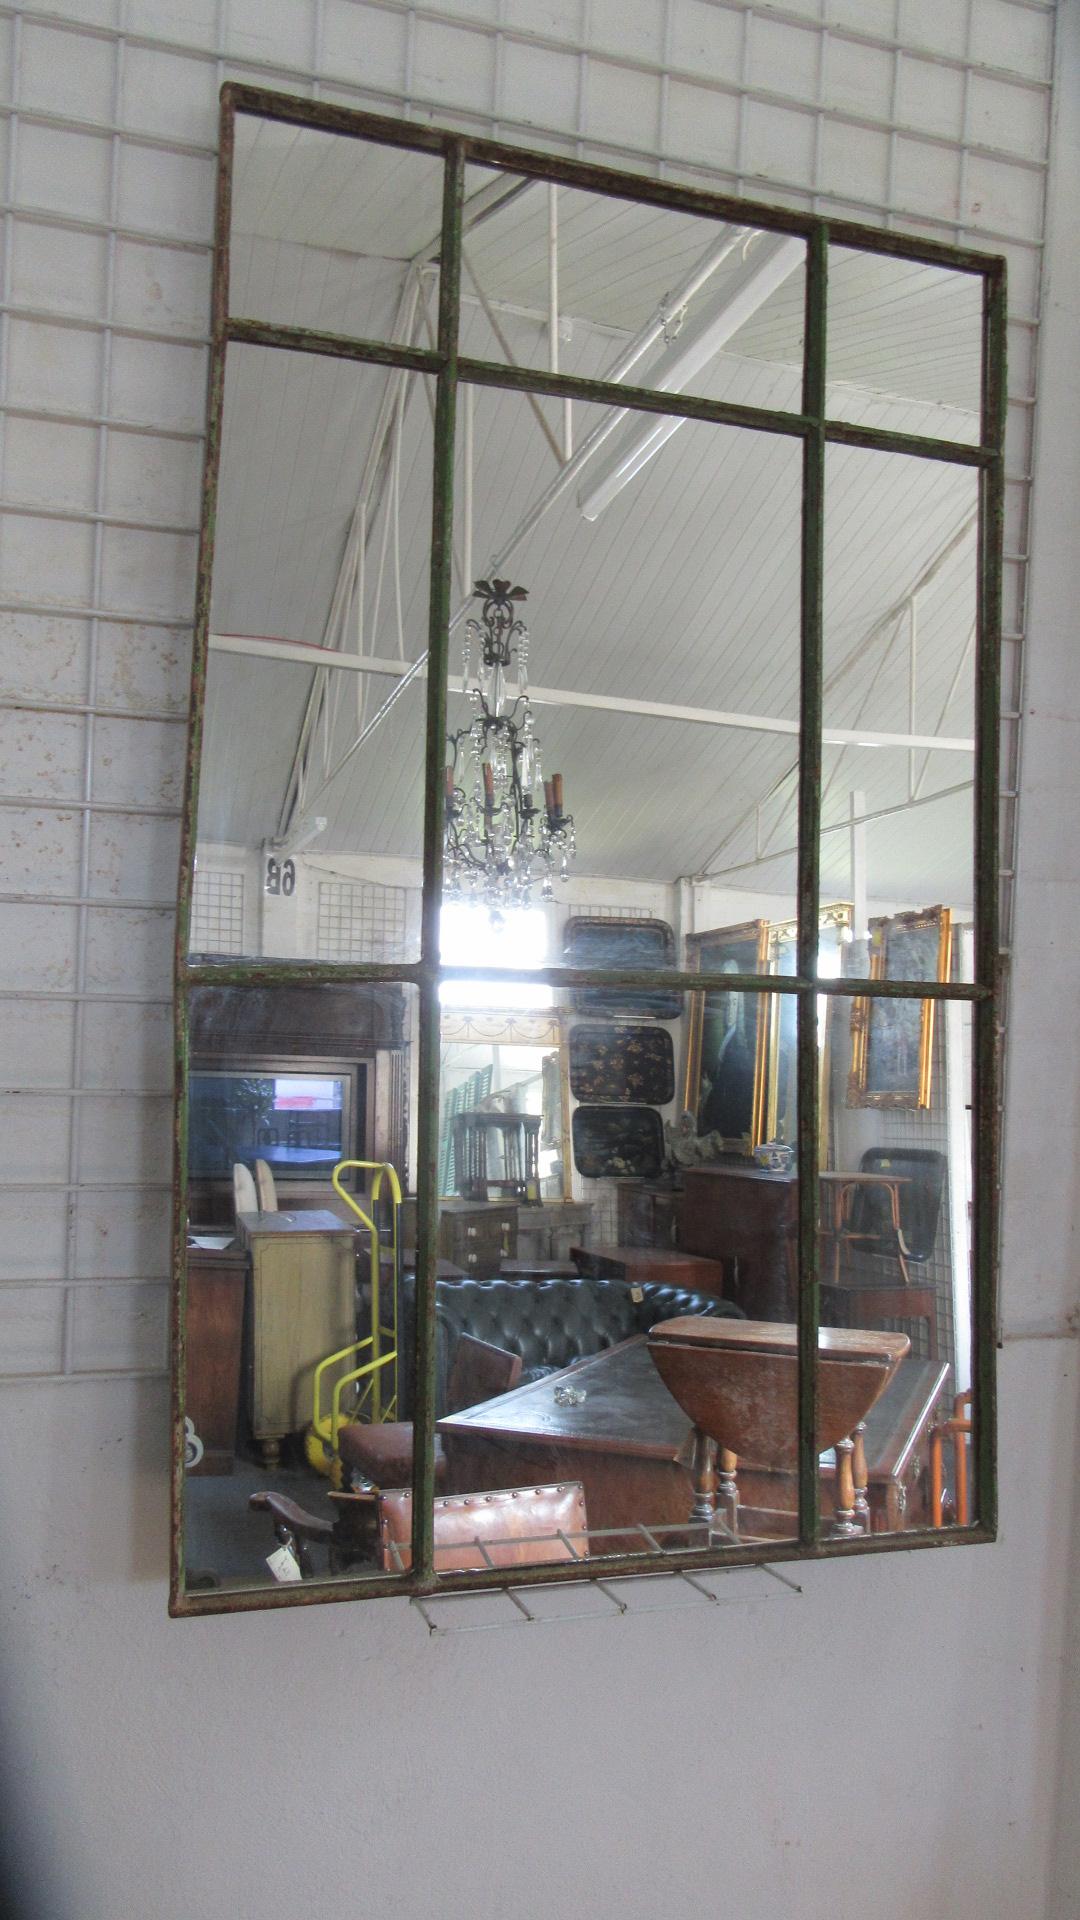 ANTIQUE CAST IRON INDUSTRIAL WINDOW MIRROR